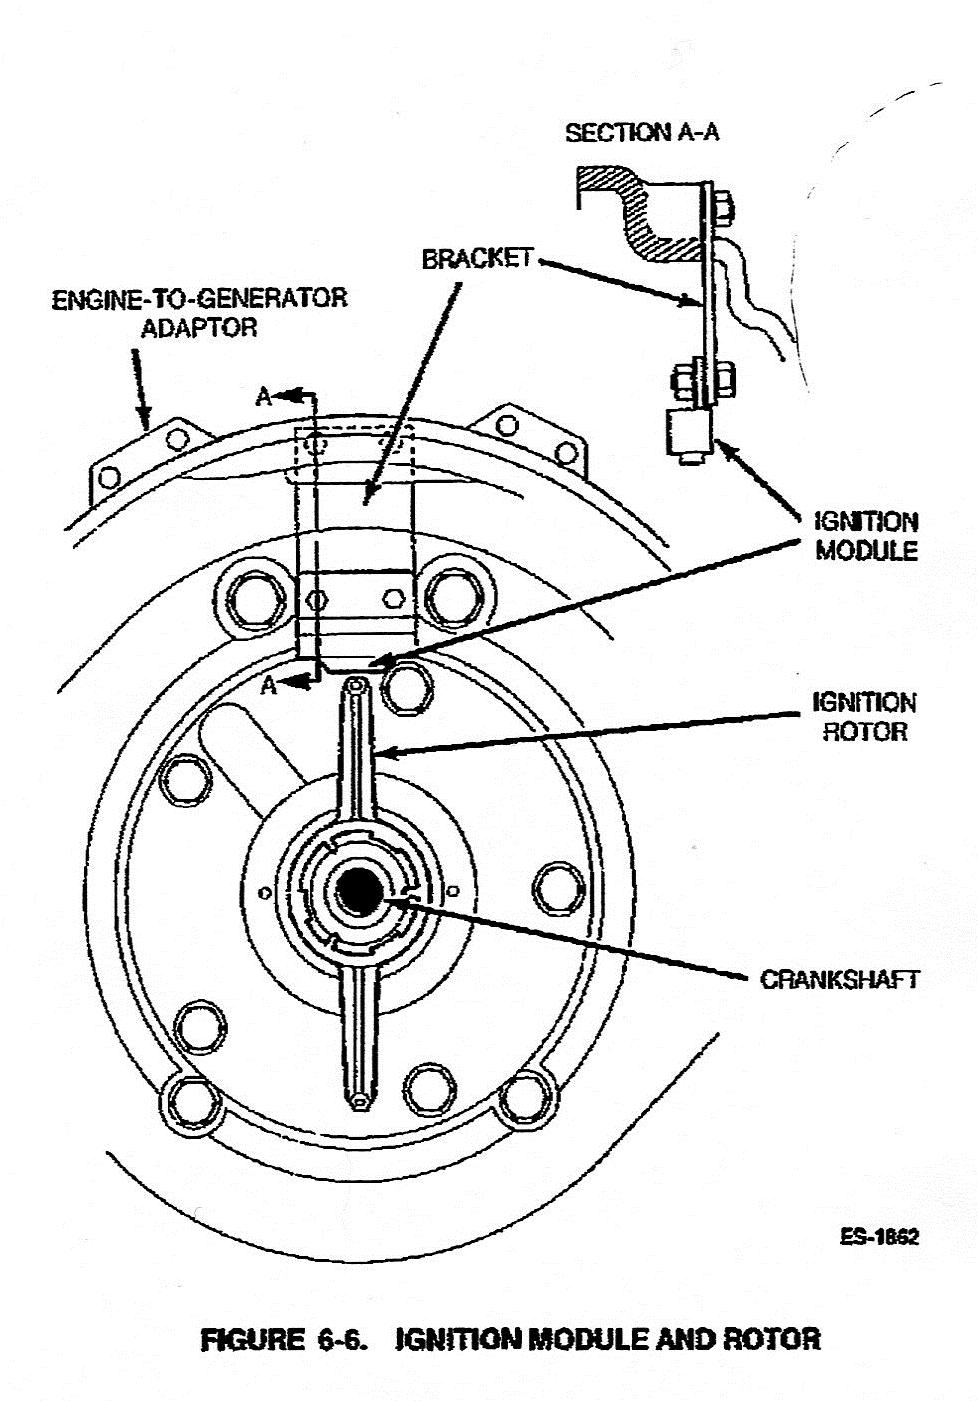 Luxury Generator Onan Wiring Circuit Diagram Photo - Electrical and ...